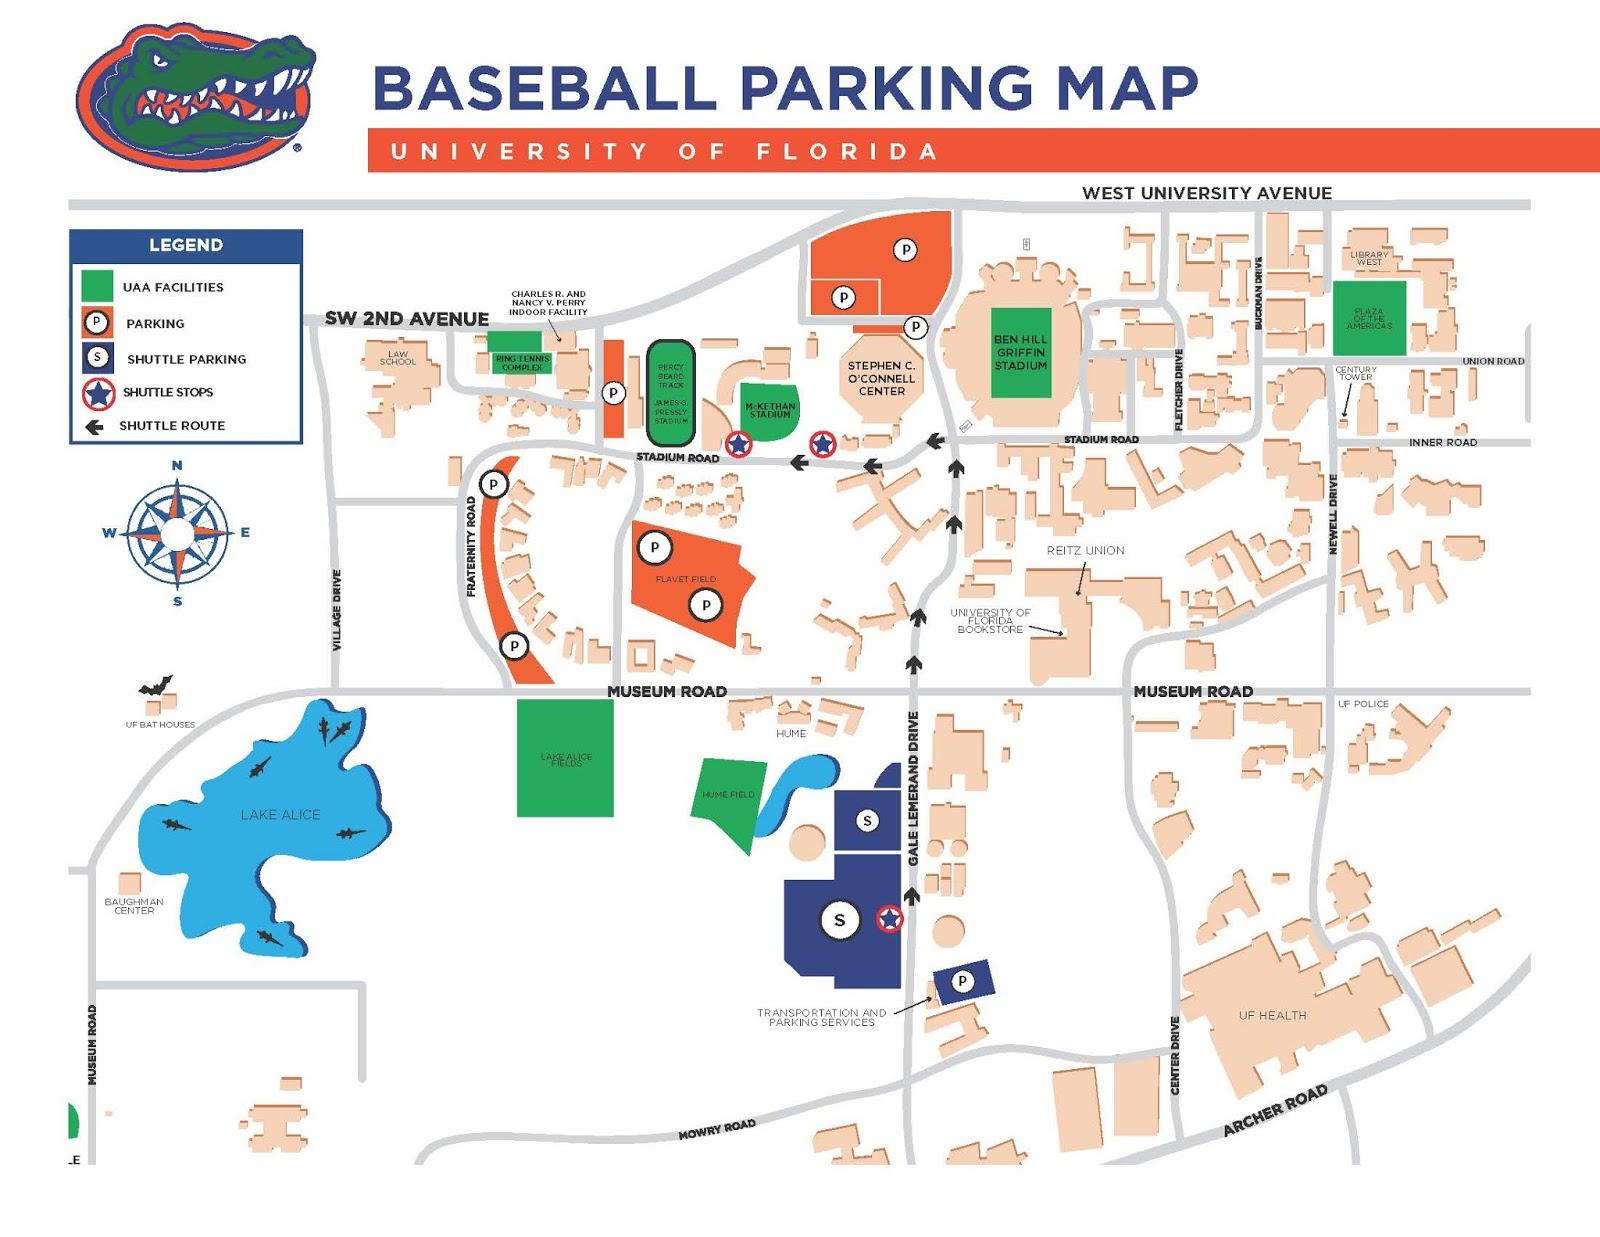 Parking Information For 2015 Ncaa Gainesville Baseball Super - University Of Florida Football Stadium Map